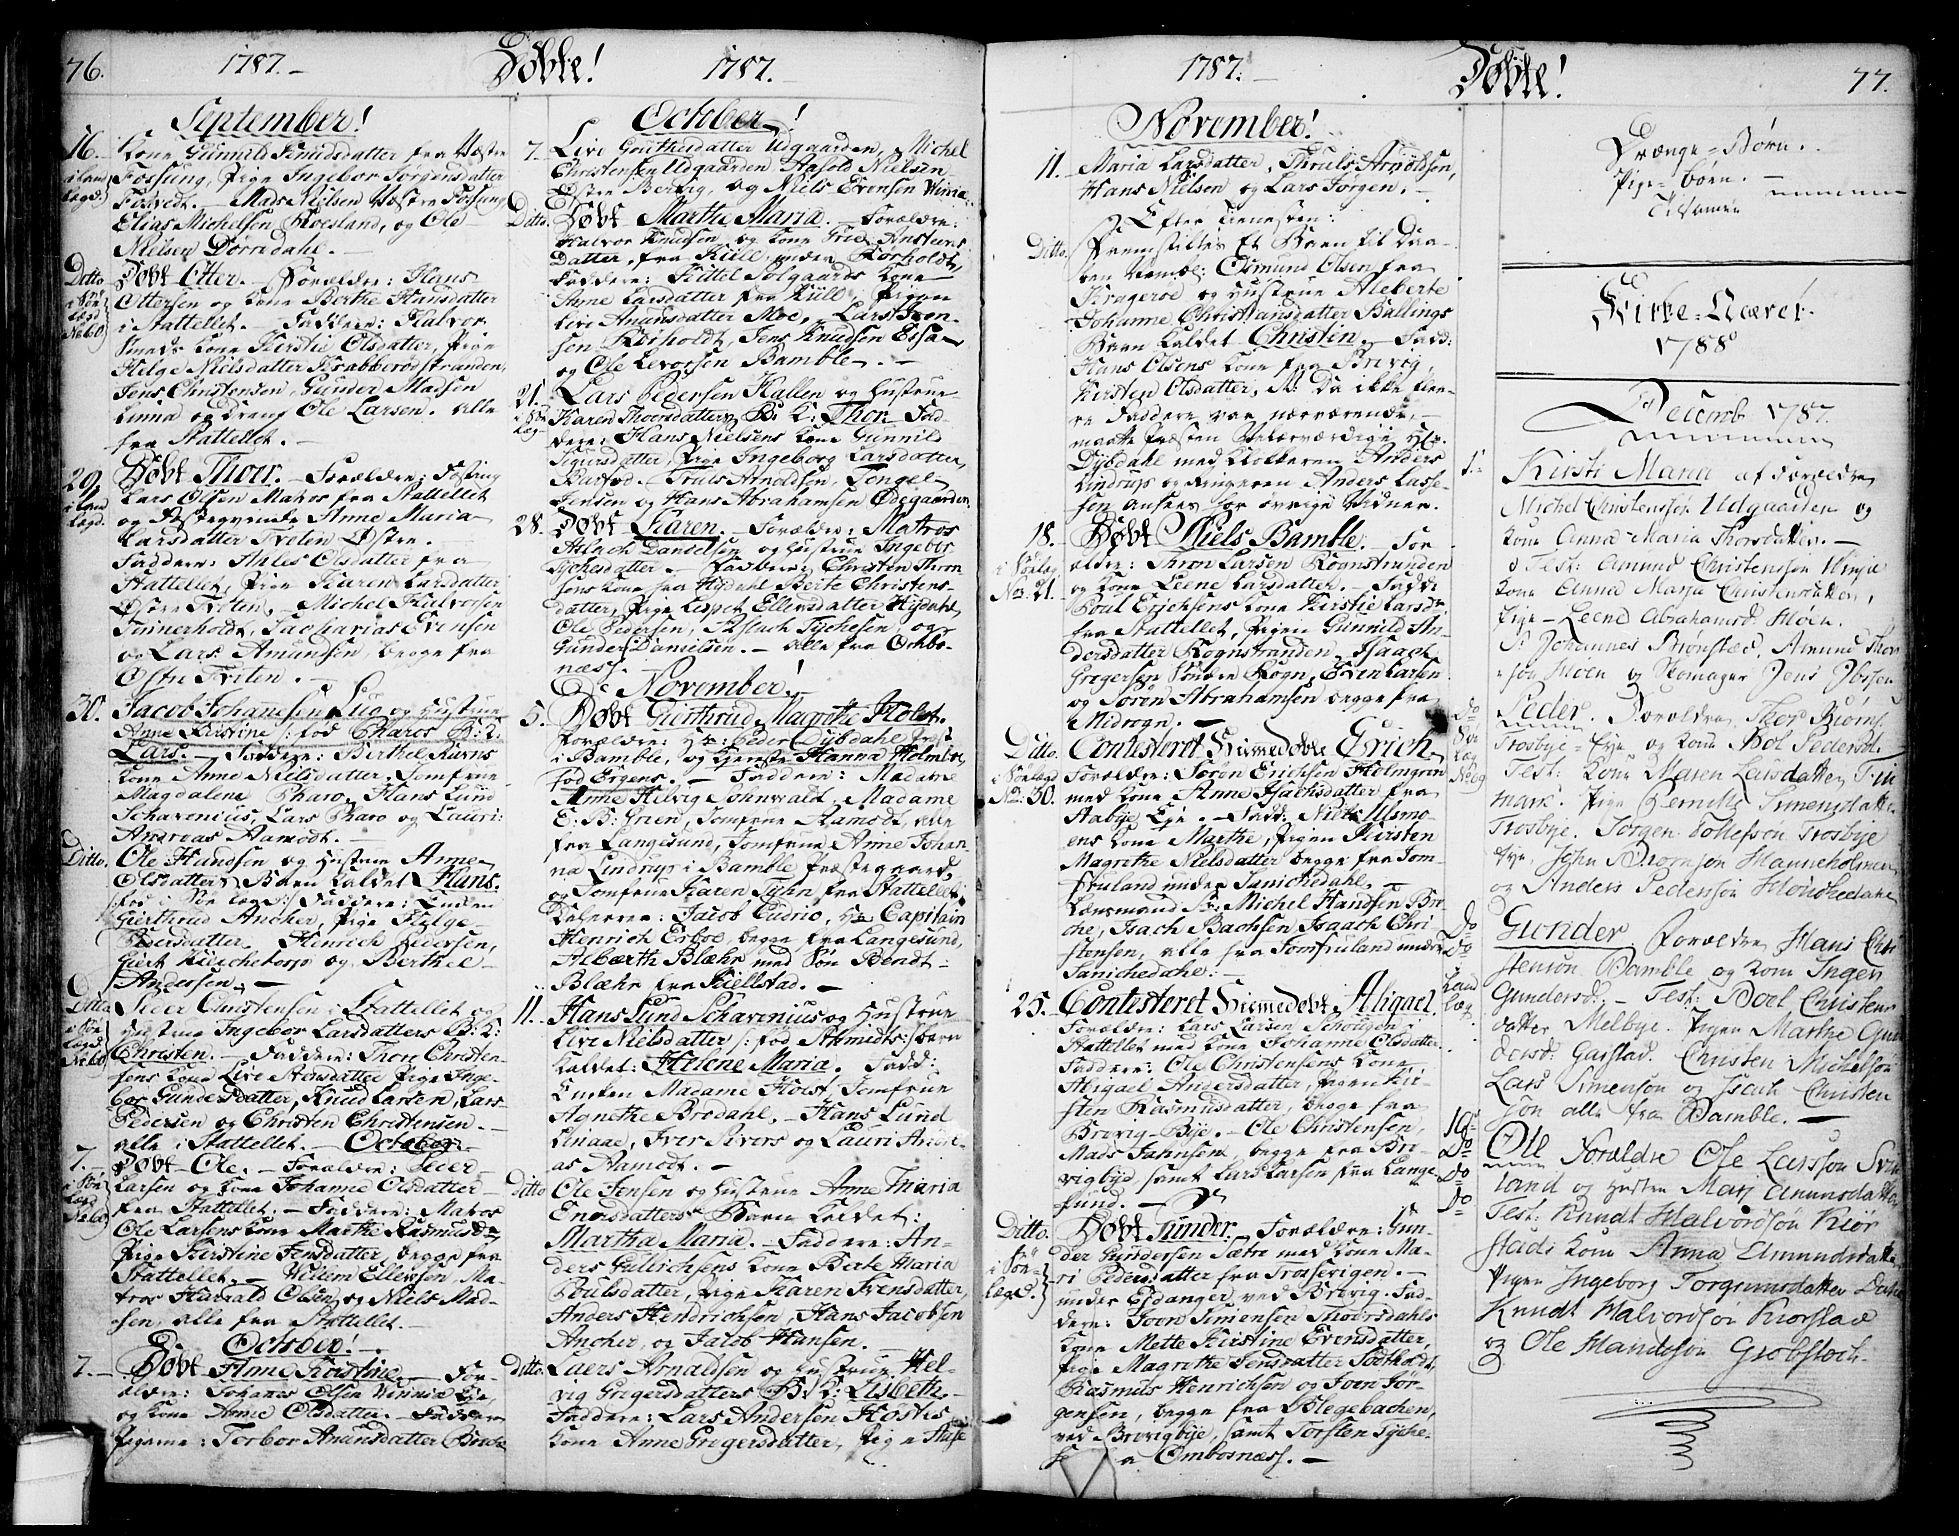 SAKO, Bamble kirkebøker, F/Fa/L0002: Ministerialbok nr. I 2, 1775-1814, s. 76-77